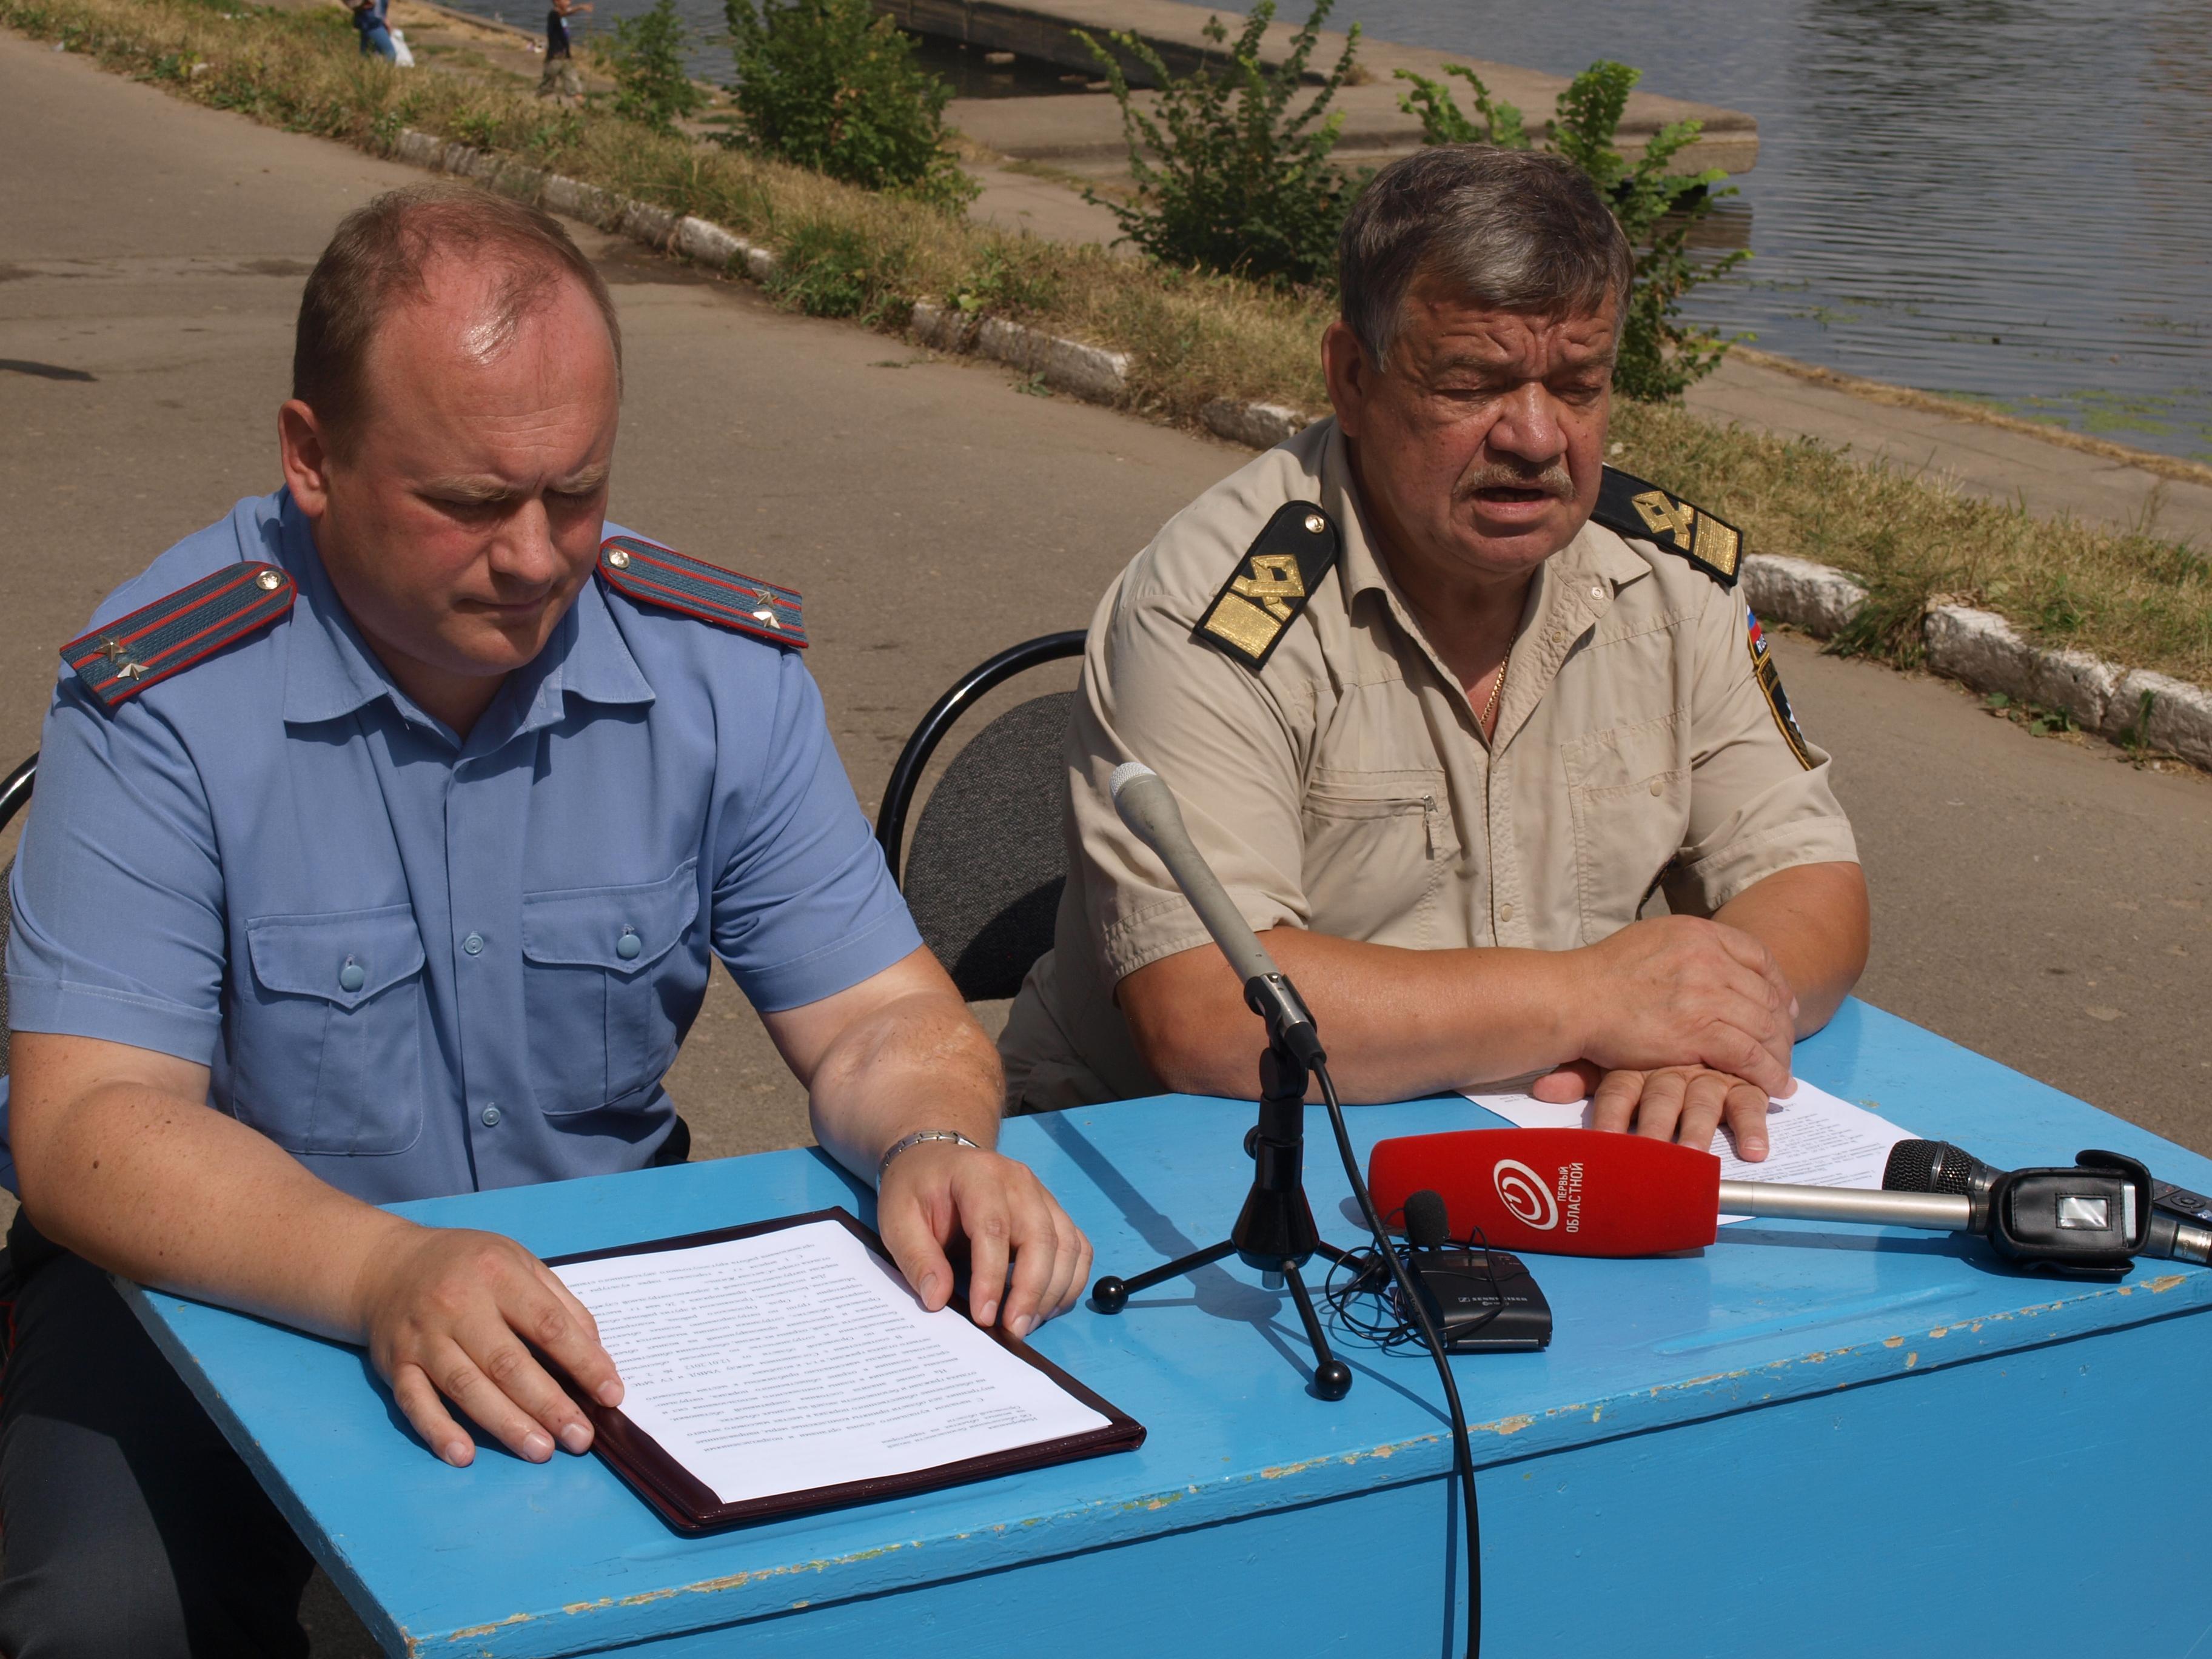 Сотрудники орловского МЧС и полиции вместе  обеспечивают безопасность на воде